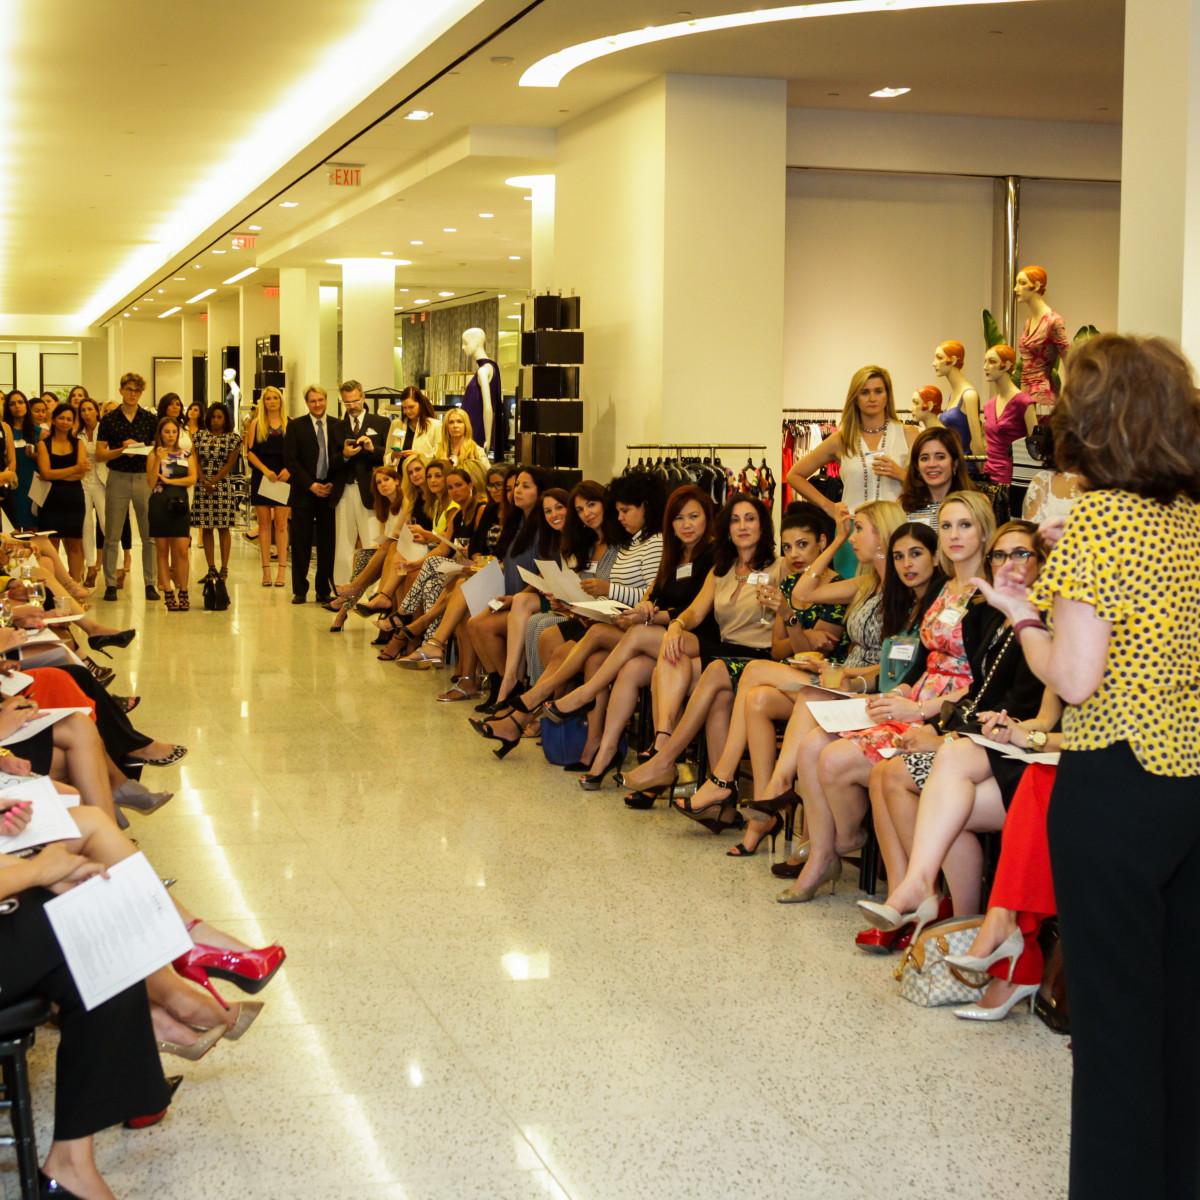 Houston, Ellevate event at Tootsies, August 2015, Lidya Osadchey